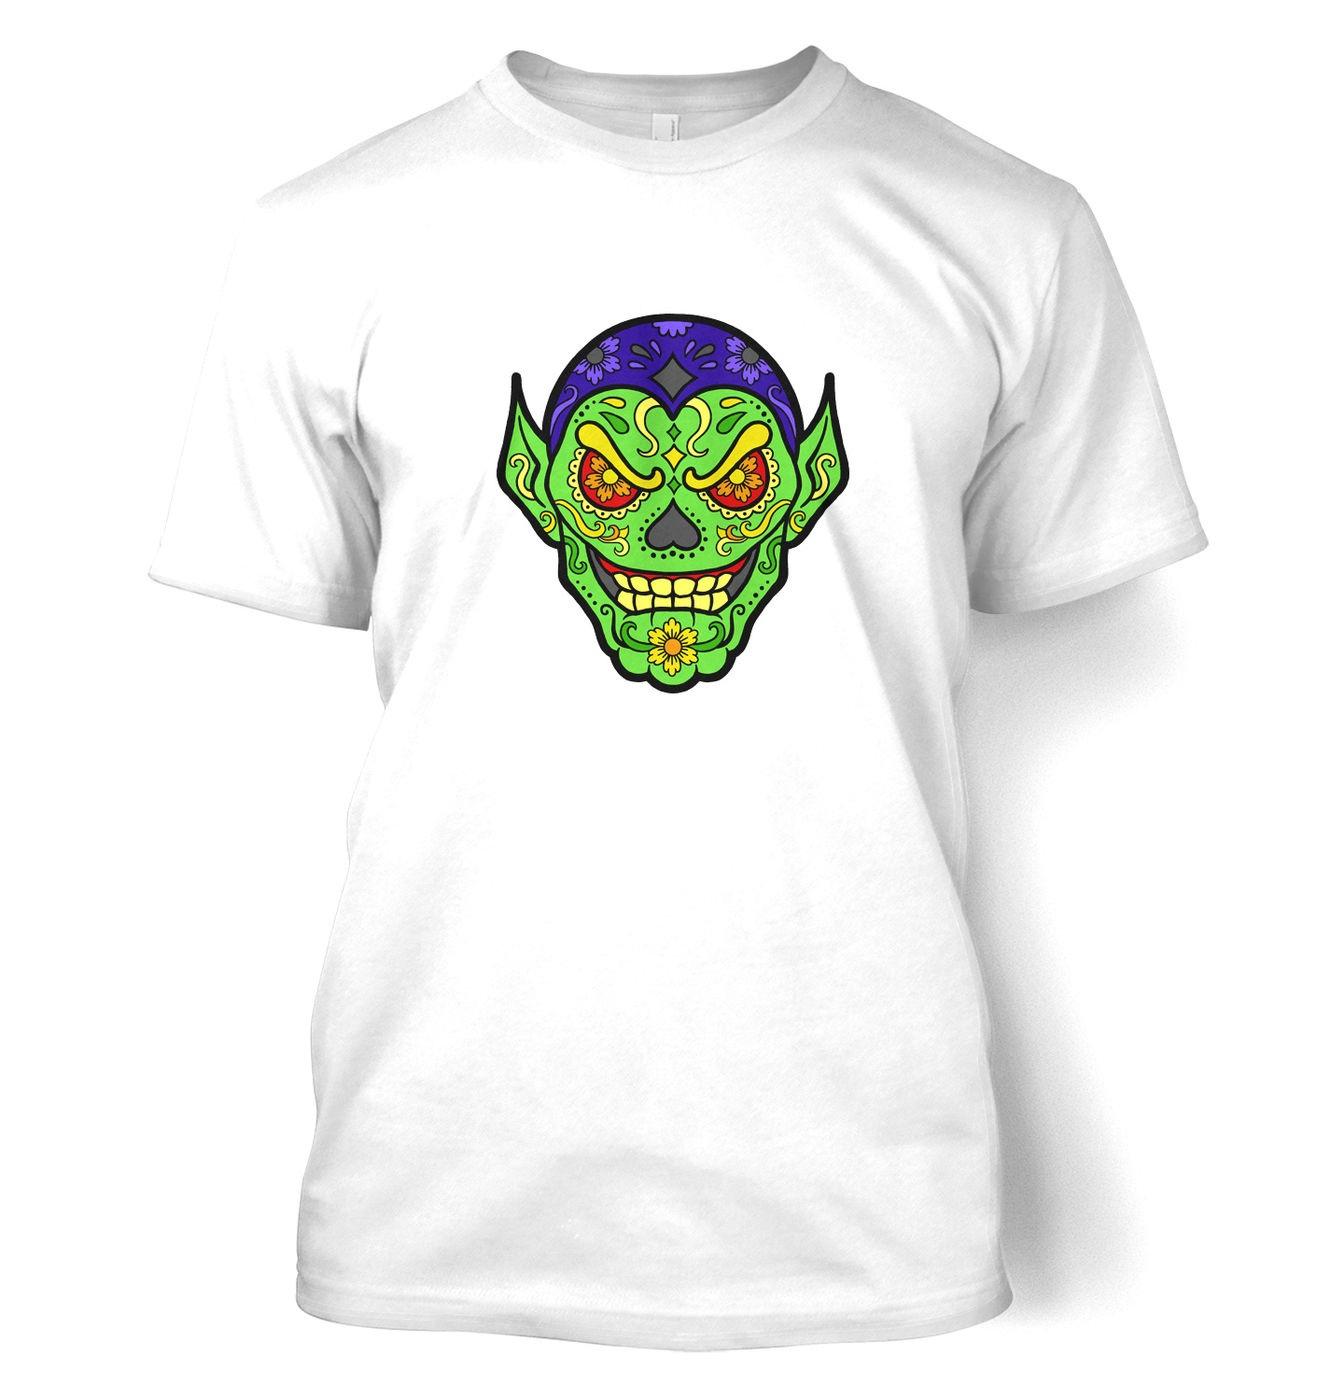 Sugar Skrull t-shirt by Something Geeky